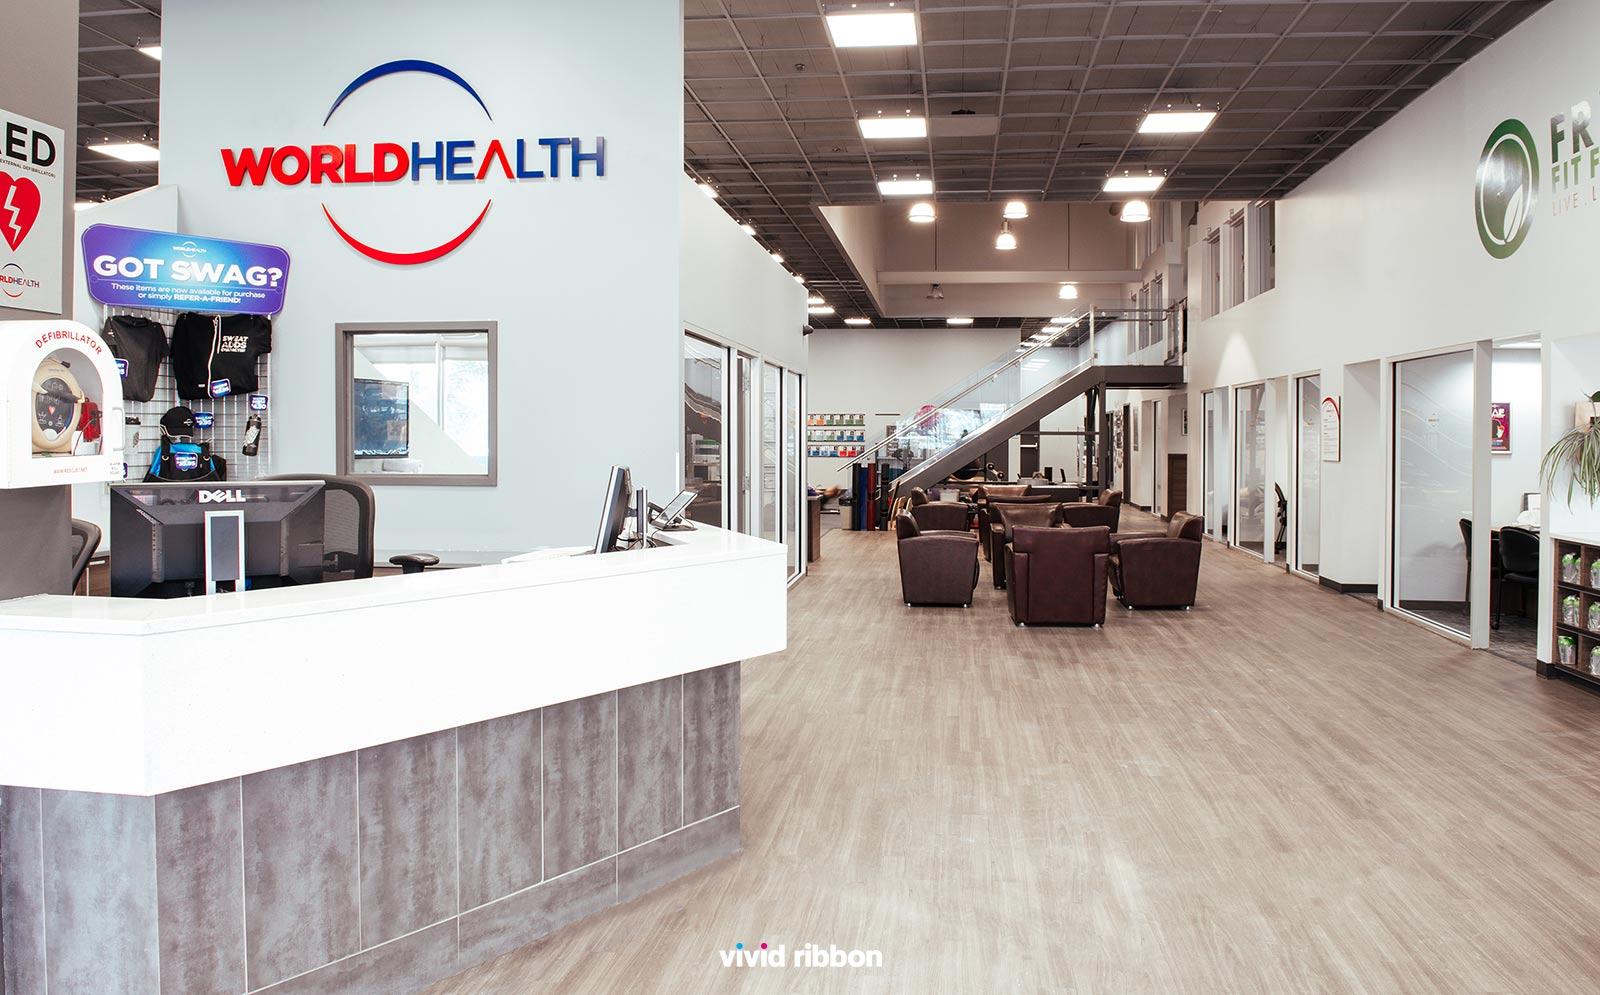 World-Health-Edmonton-WH-Glenora-4163